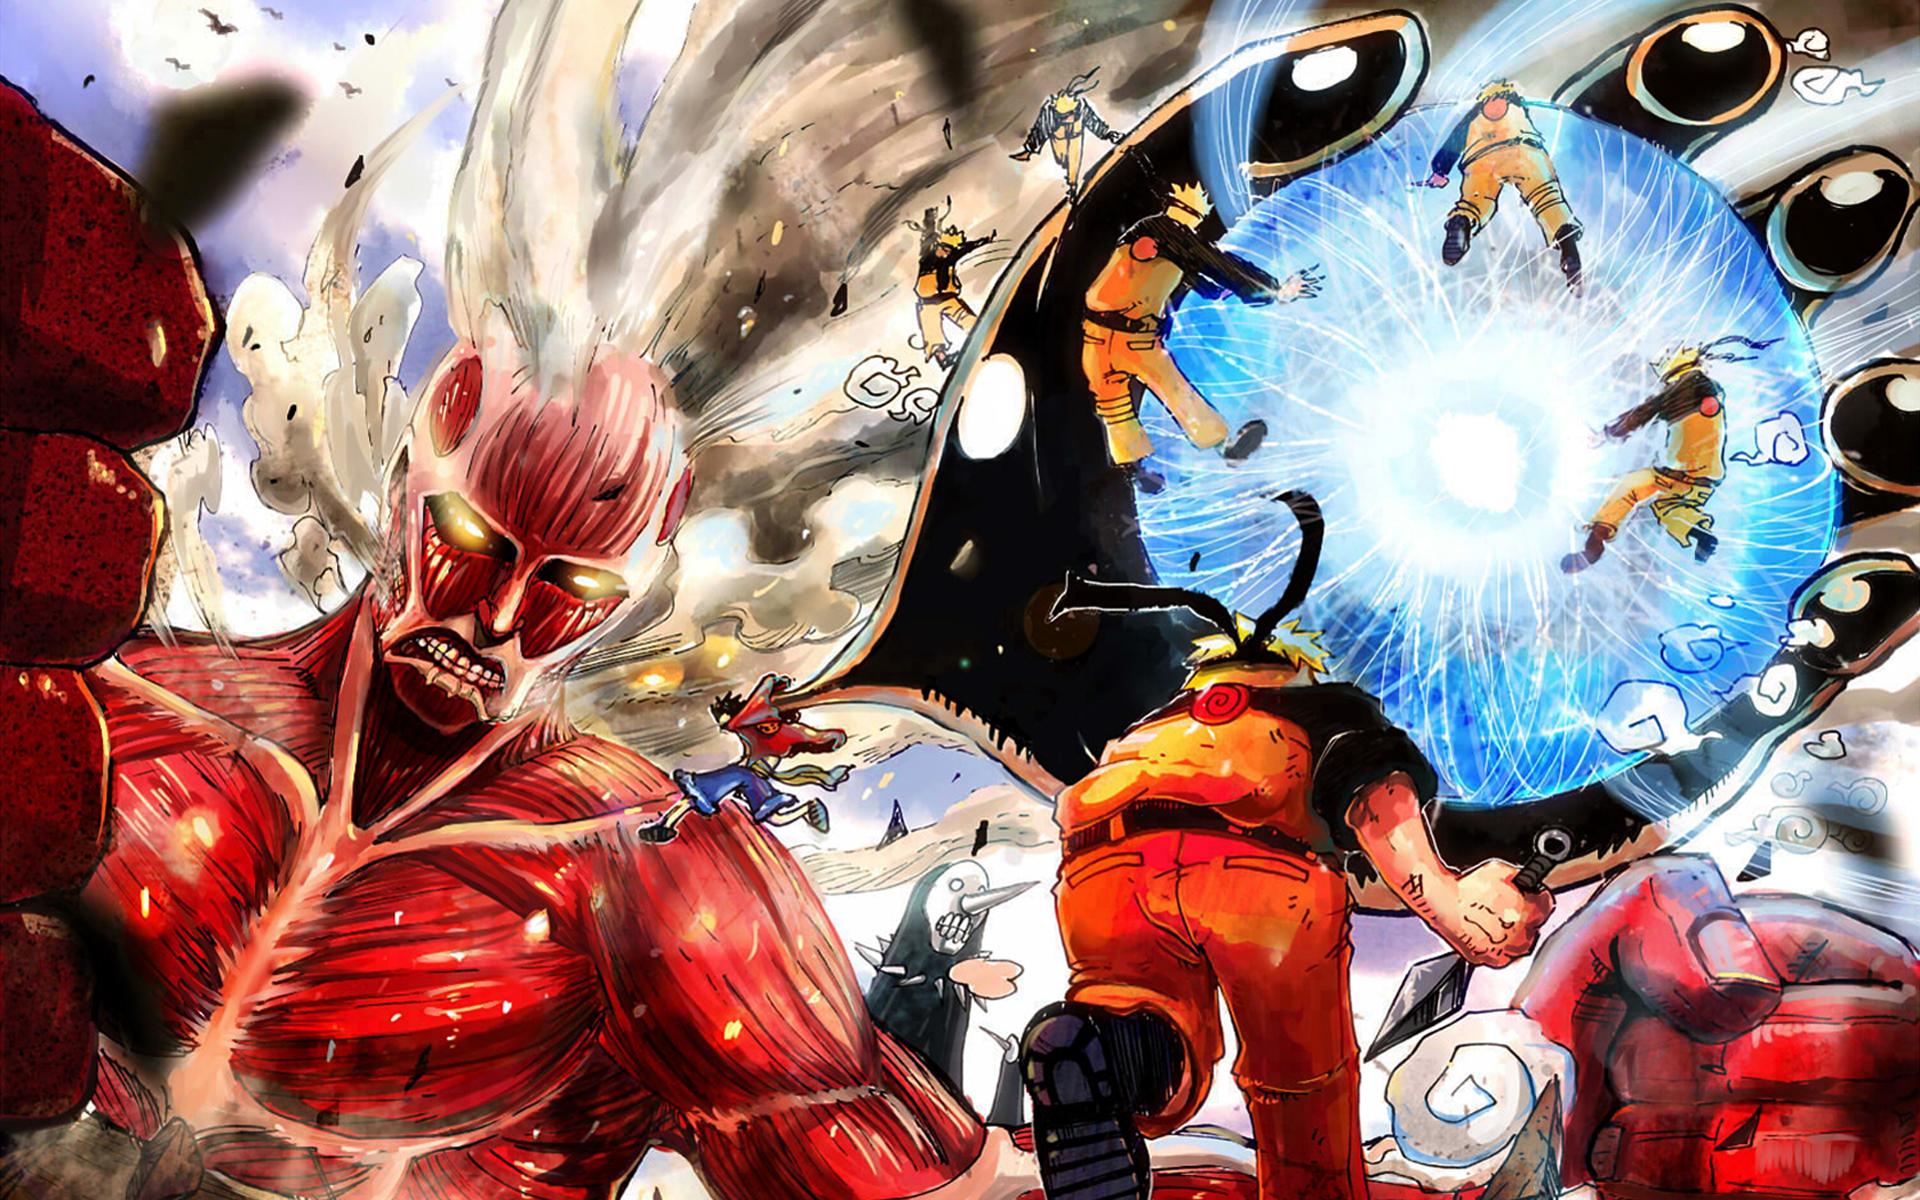 Attack on Titan One Piece Naruto Bleach Wallpaper HD 1920x1200